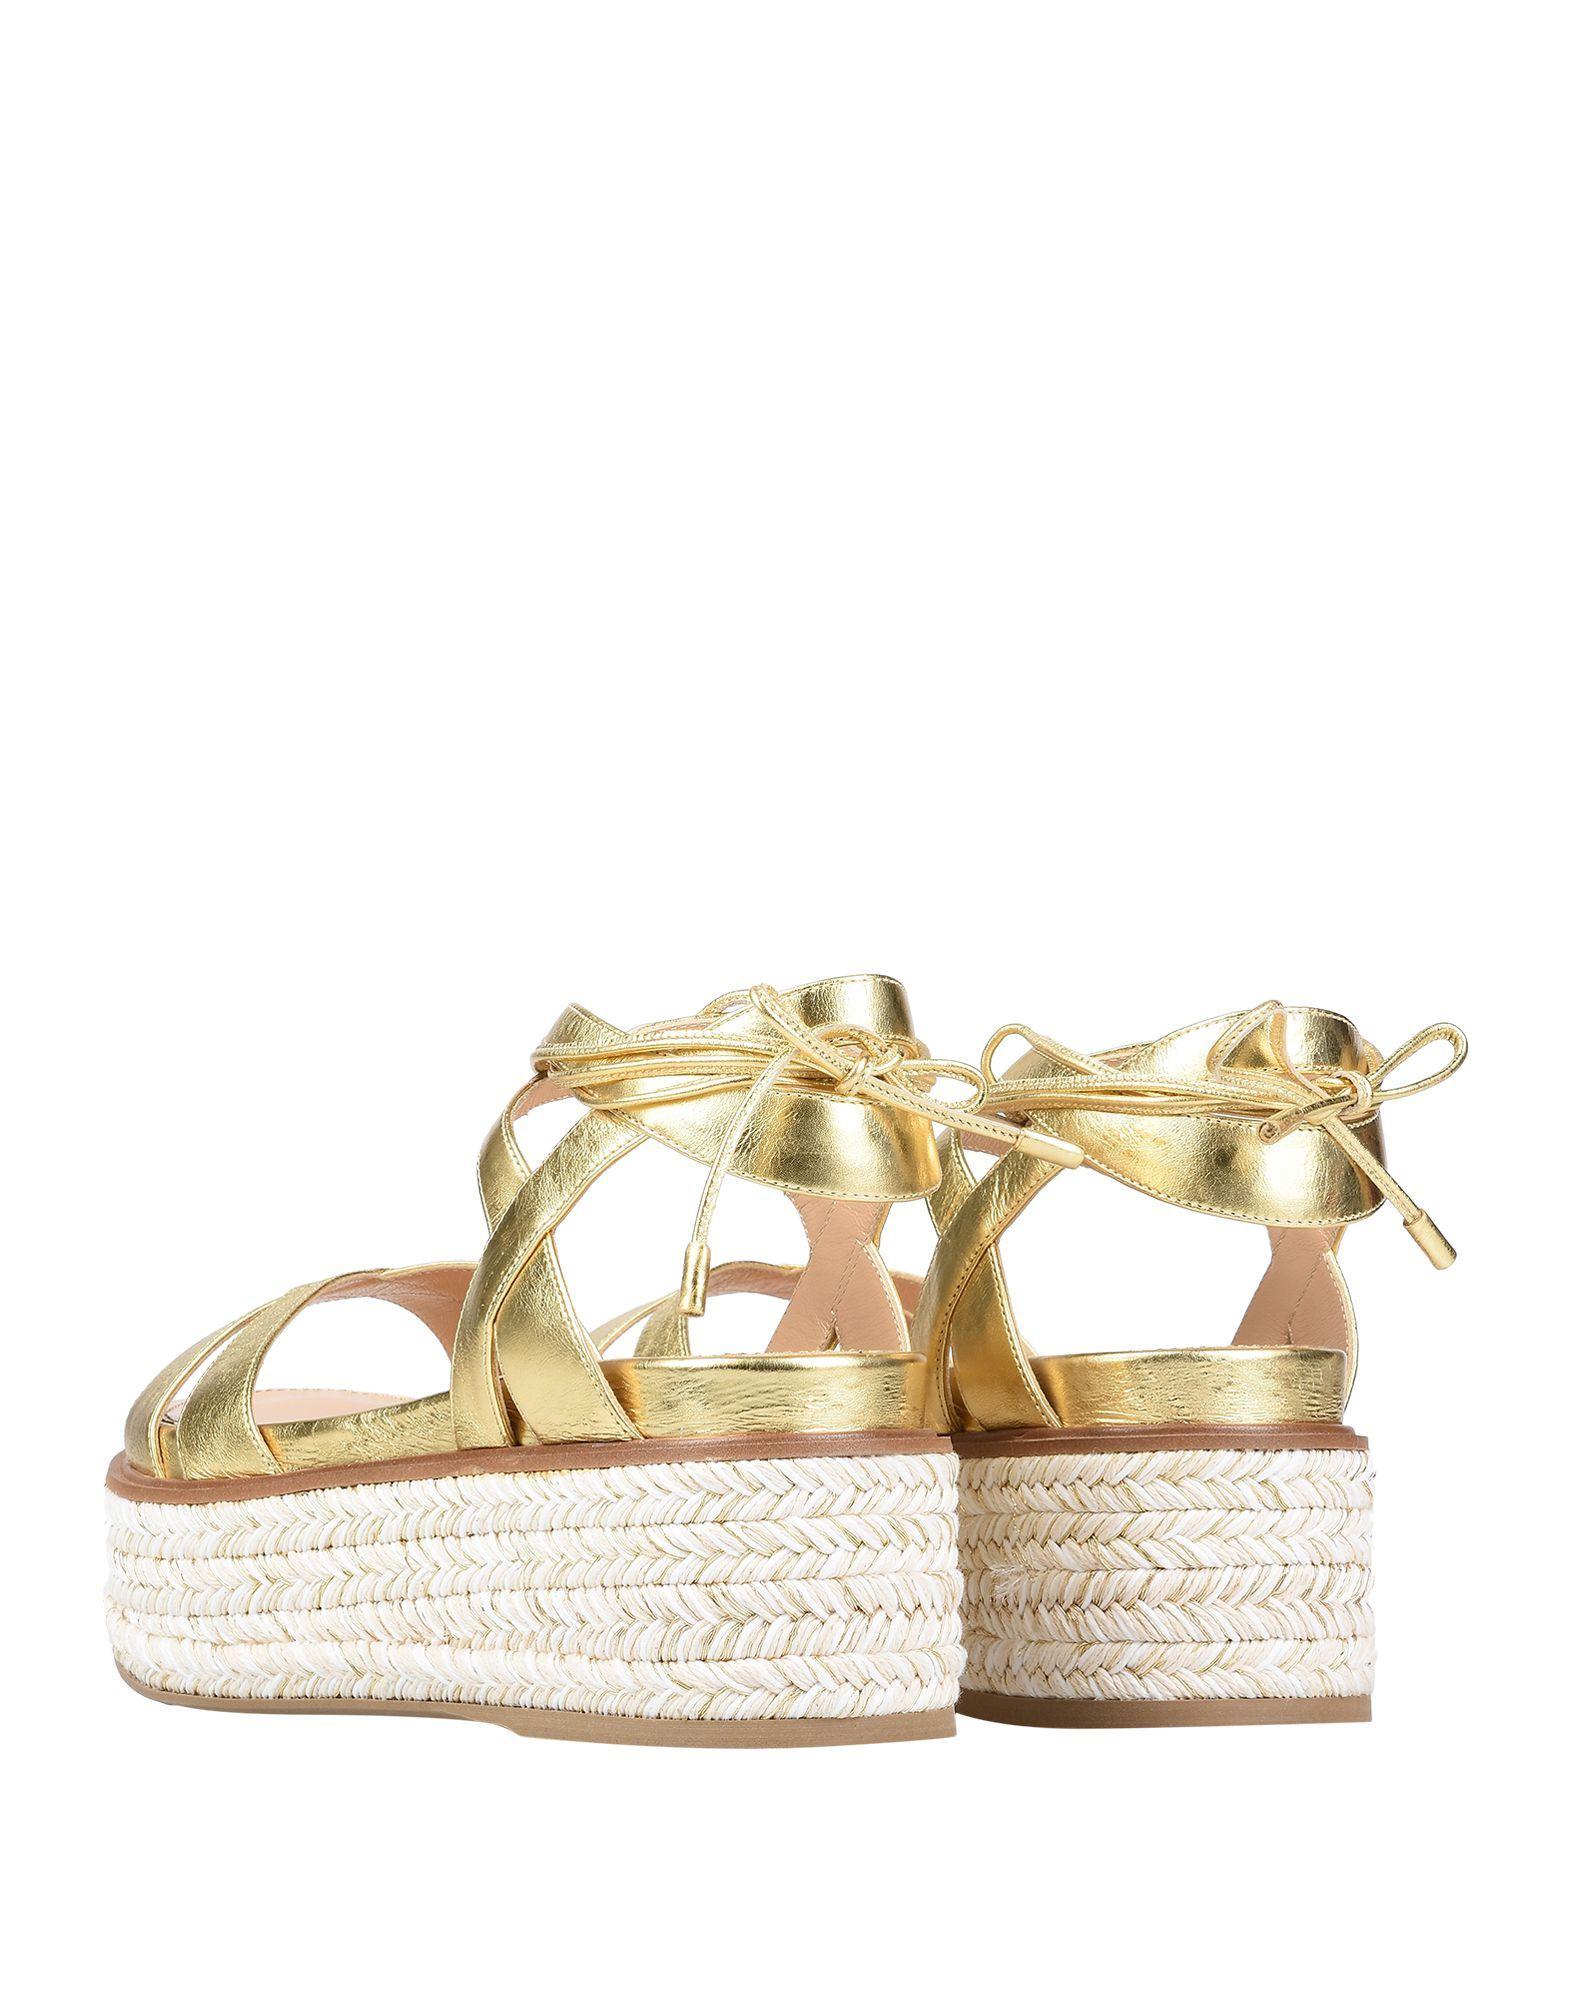 Sergio Rossi Gold Leather Espadrille Sandals